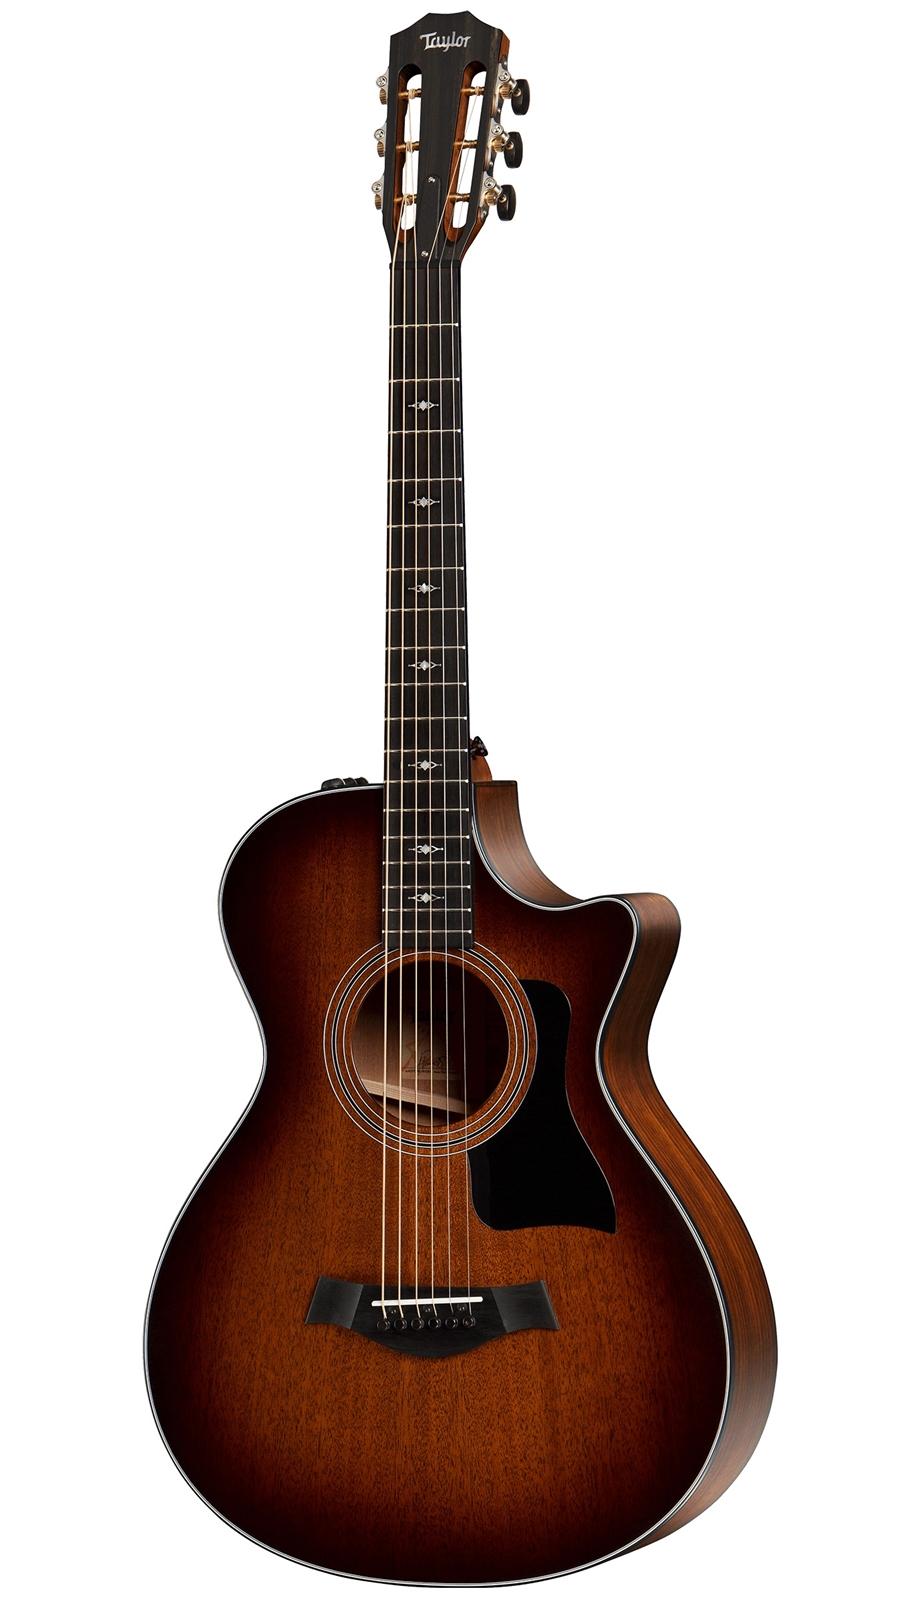 taylor 322ce 12 fret in sunburst at the guitar sanctuary mckinney texas